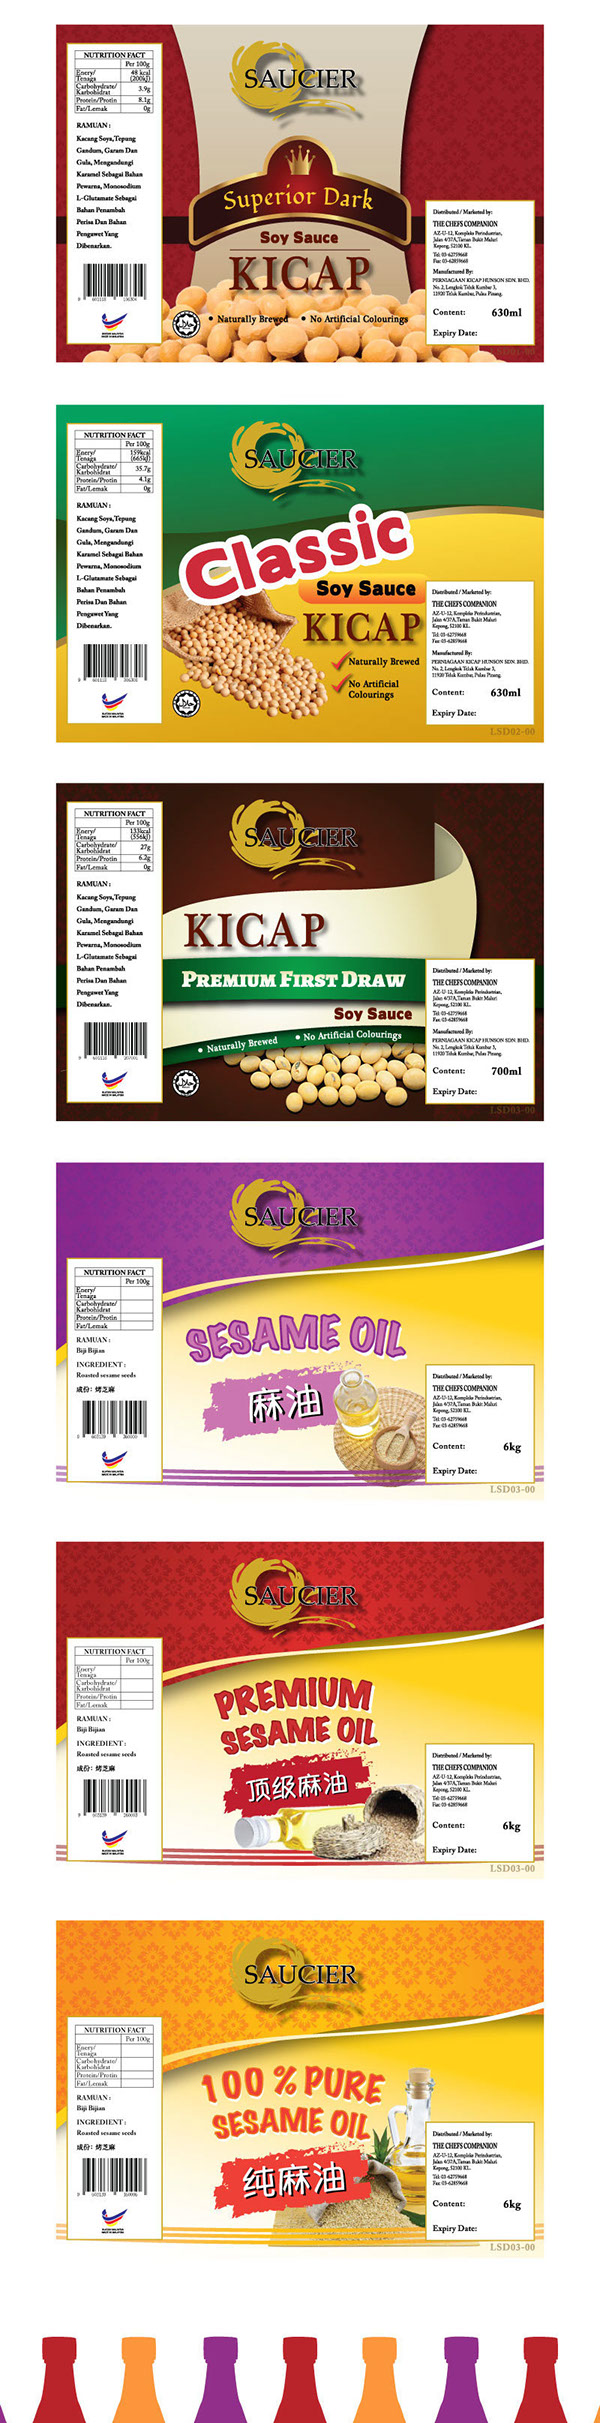 Soy Sauce Label : sauce, label, Sauce, Label, Packaging, Design, Behance, Sauce,, Design,